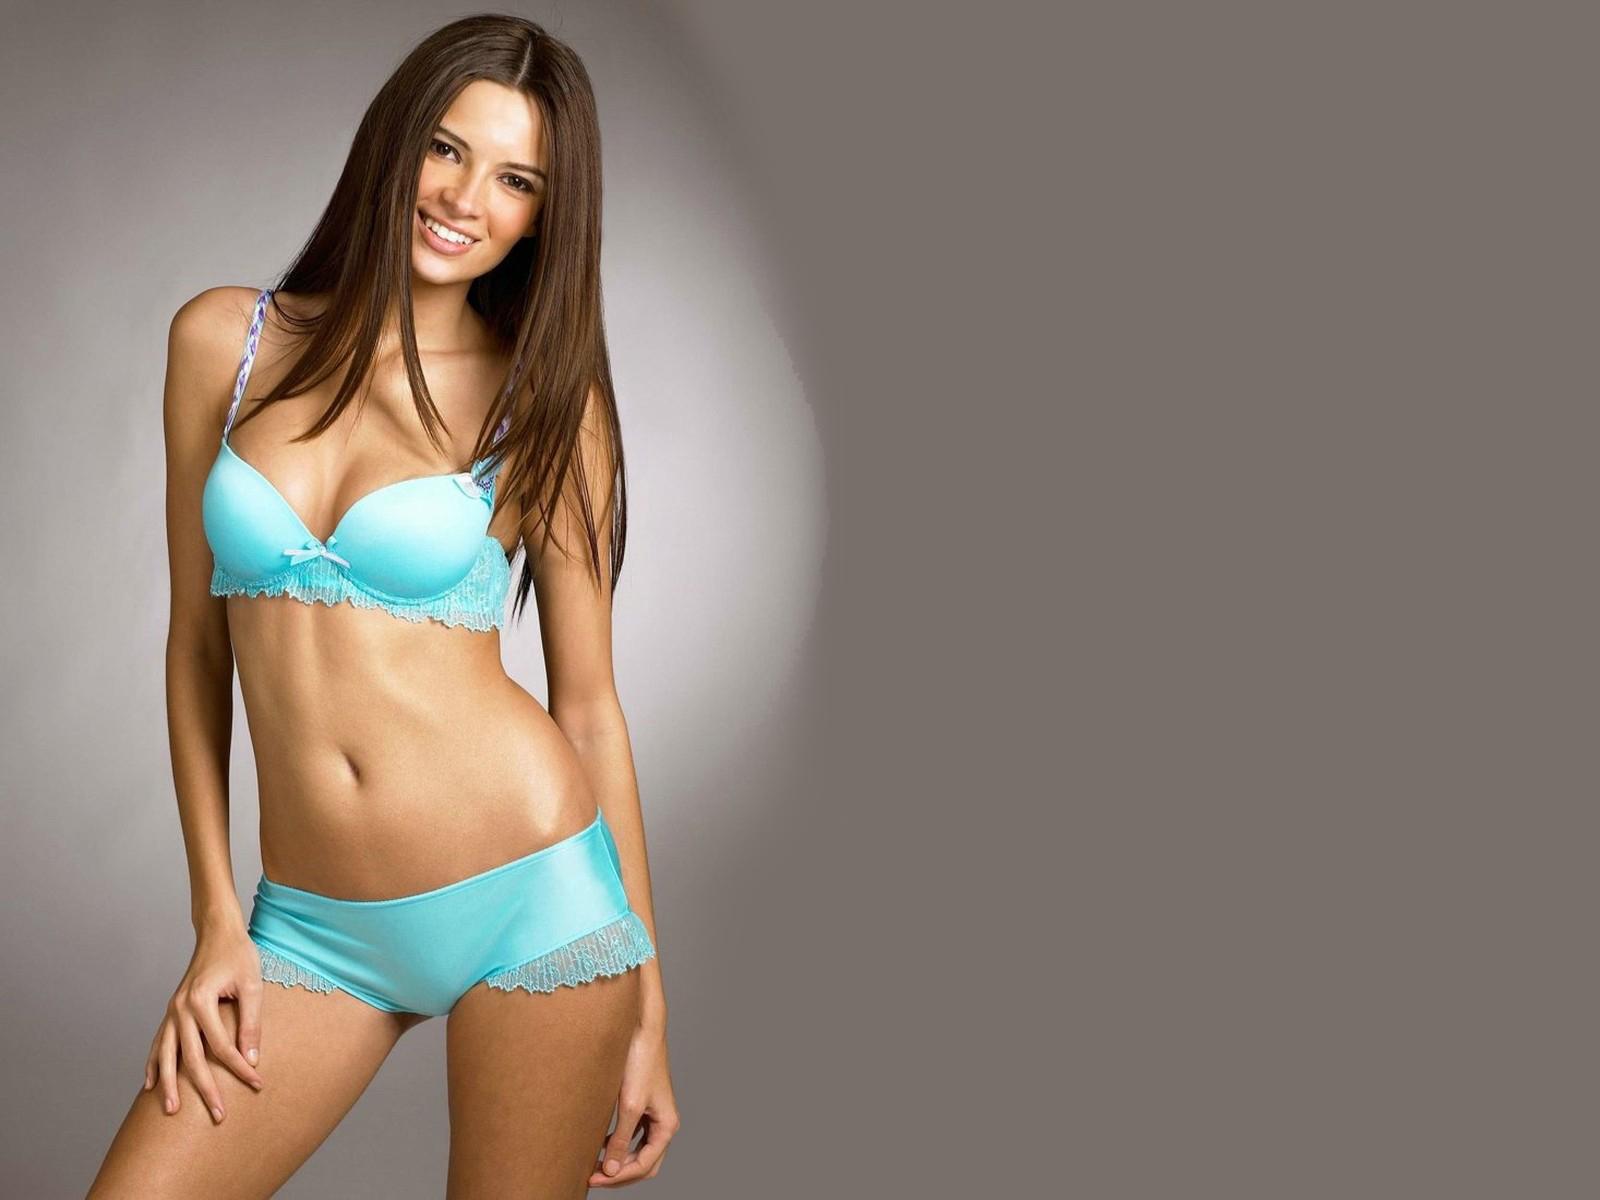 High resulation bikini photos